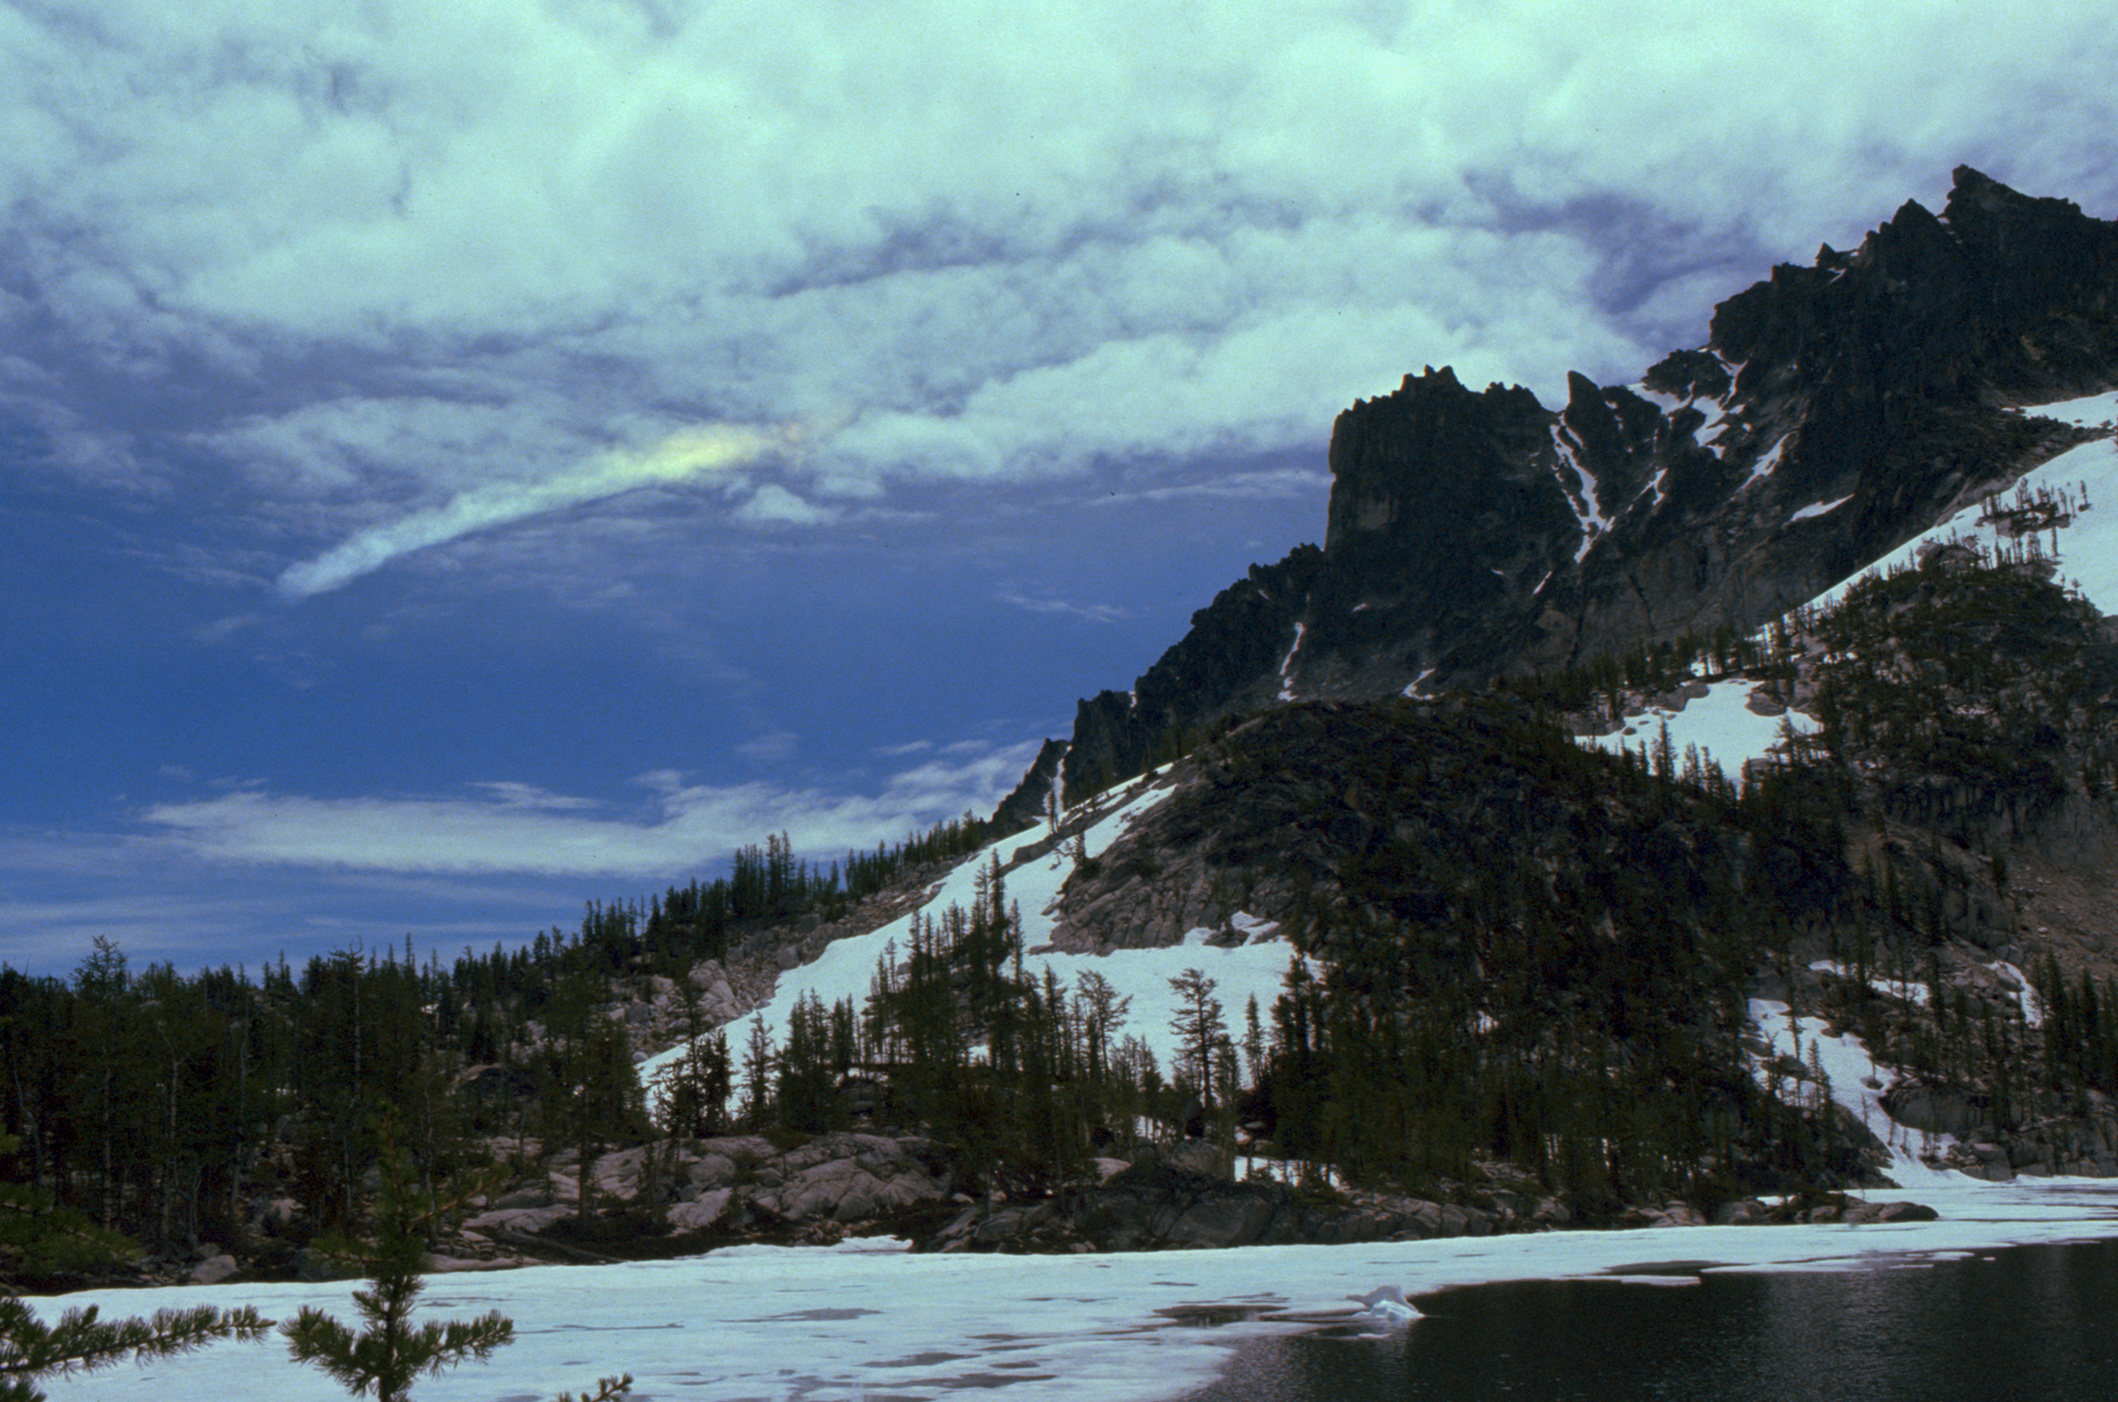 Rainbow over Leprechaun Lake